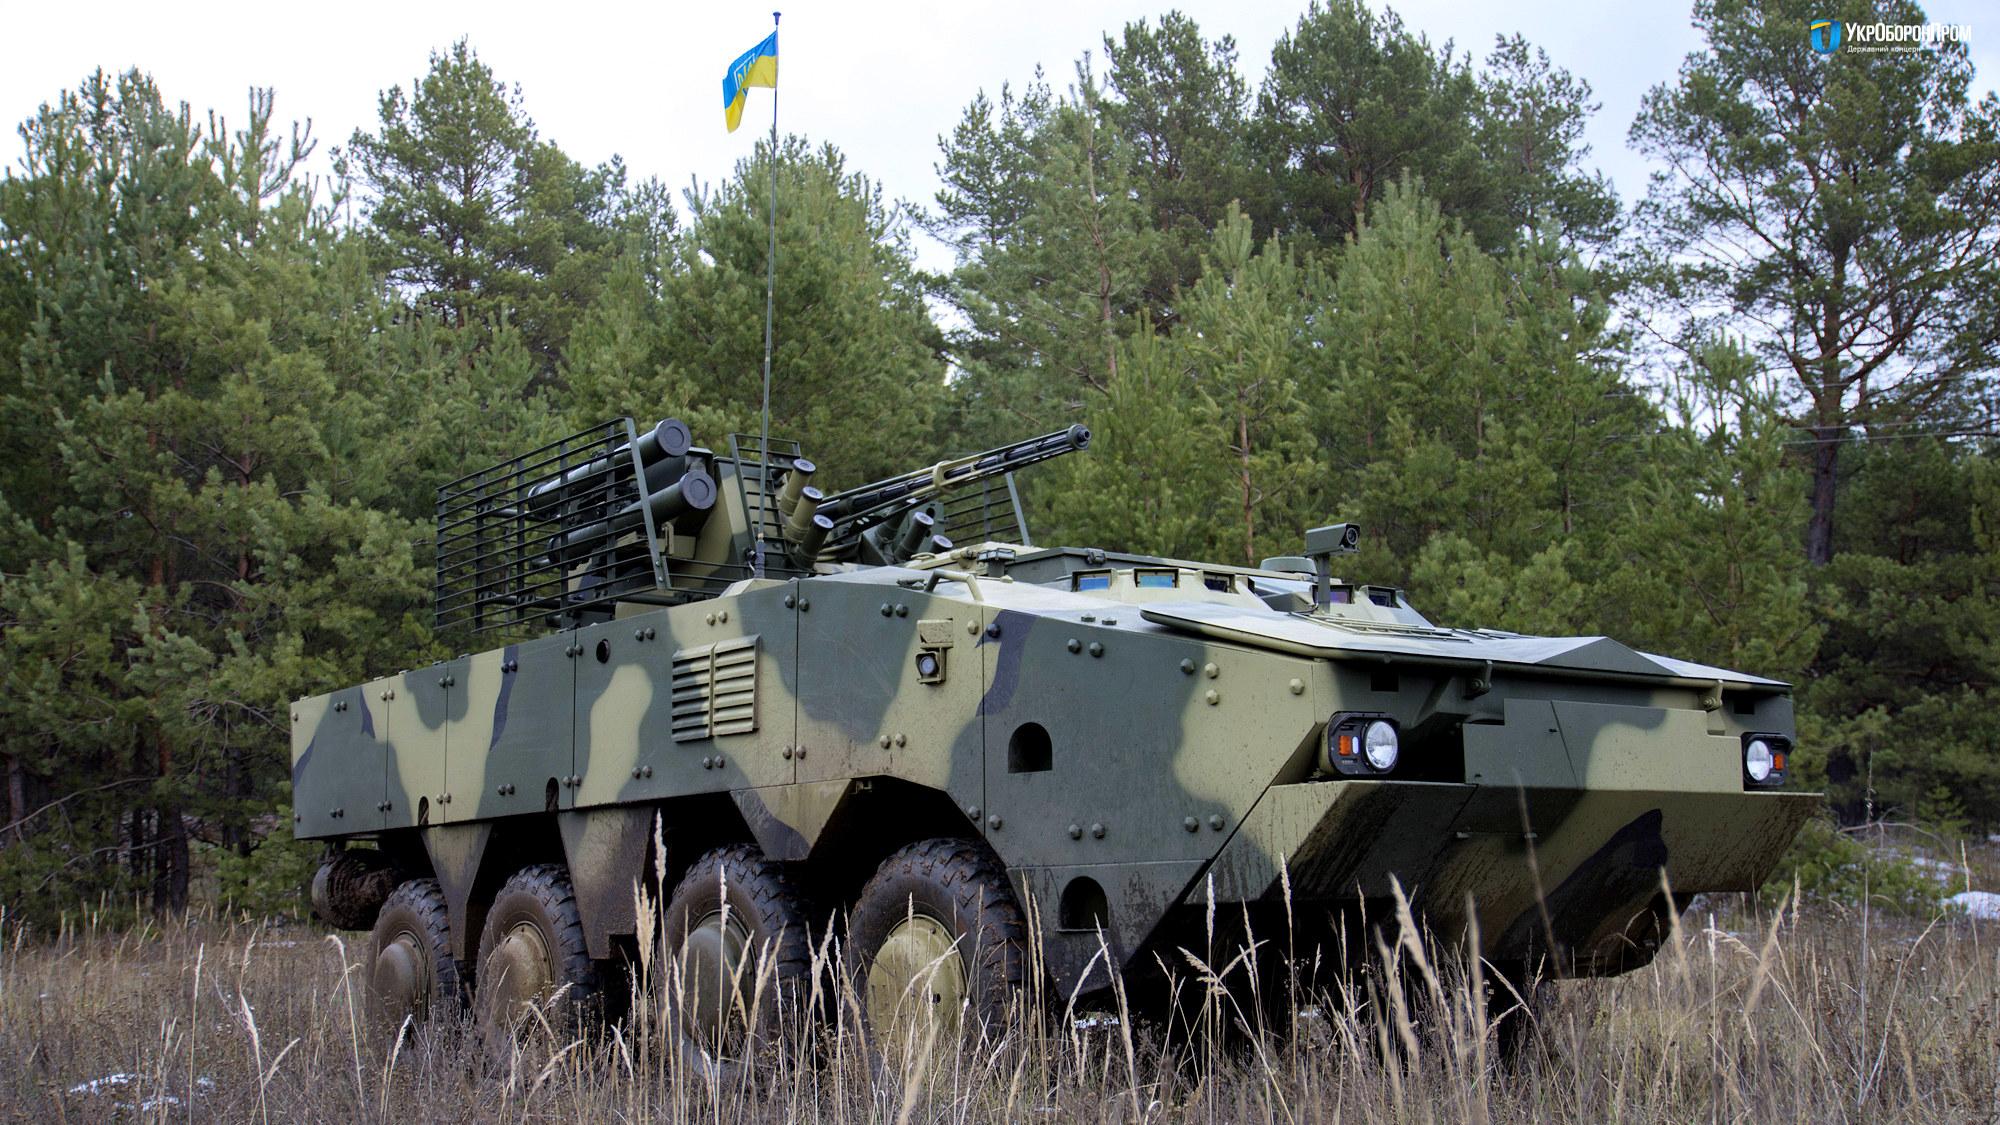 Phot Ukraine Prepares Armed Ugvs - Swdigital